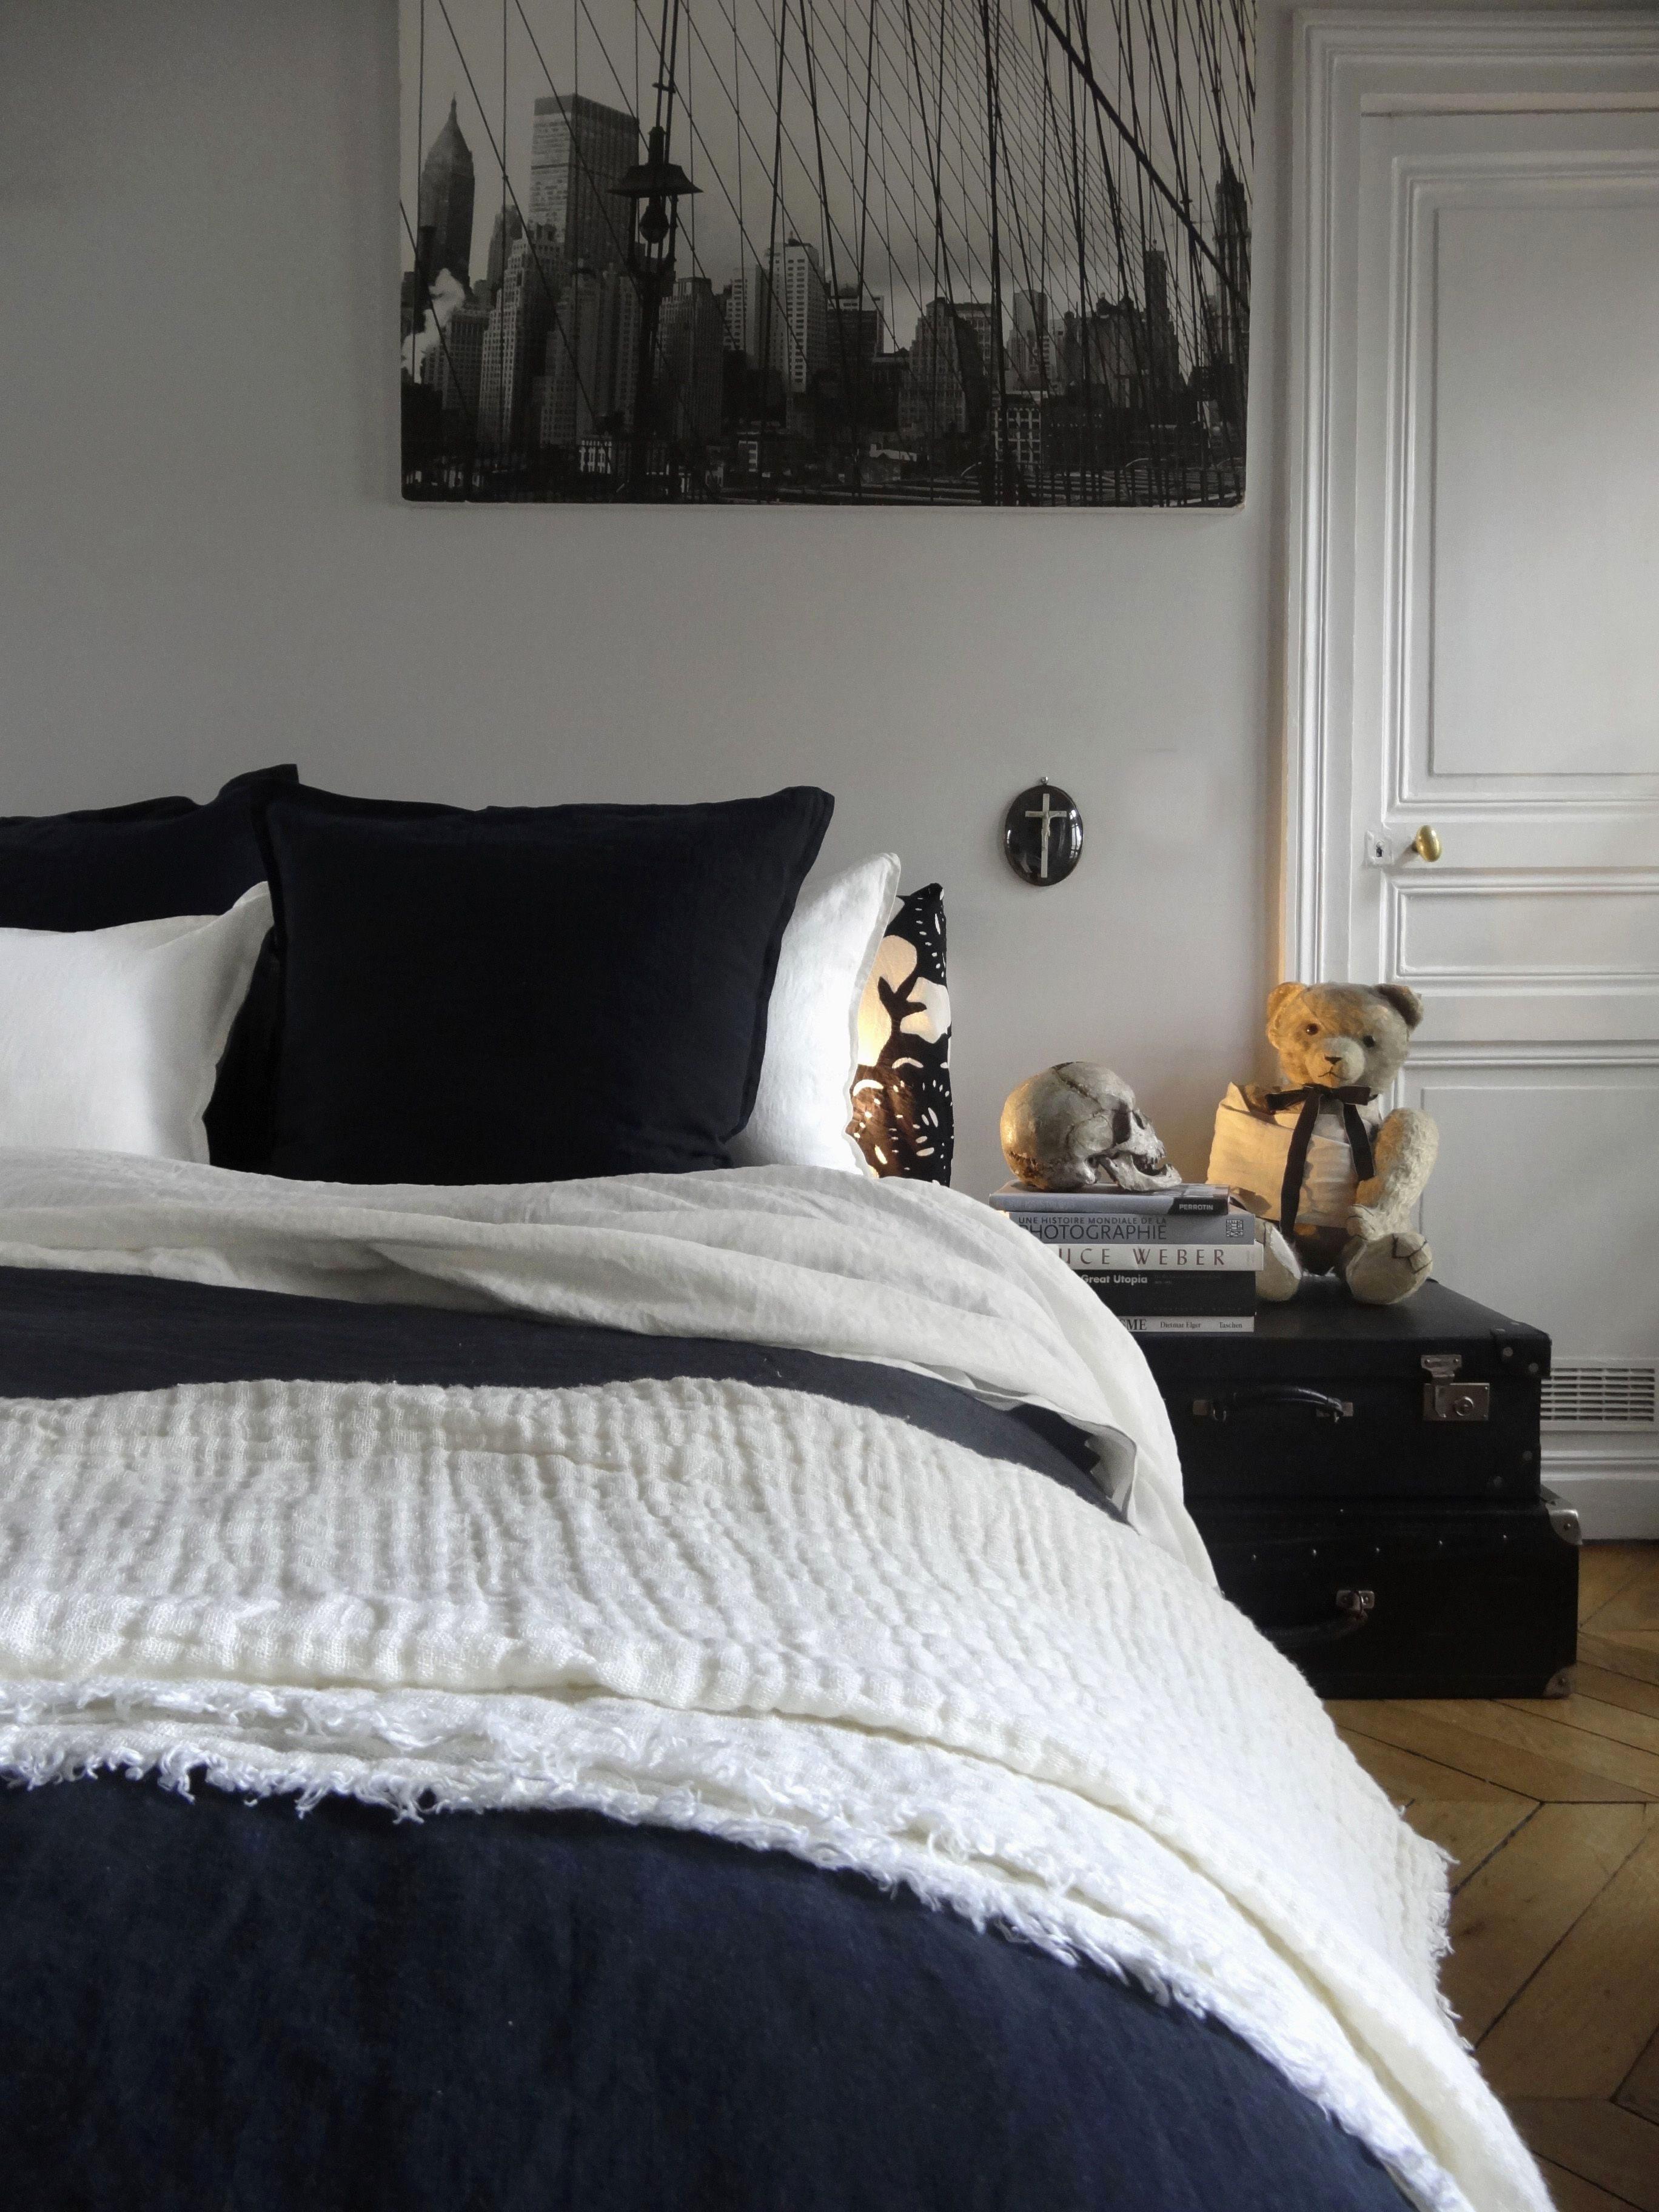 Meuble Tete De Lit Génial Chambre Avec Lit Noir De Lovely ¢‹†…¡ Meuble Salle De Bain Darty